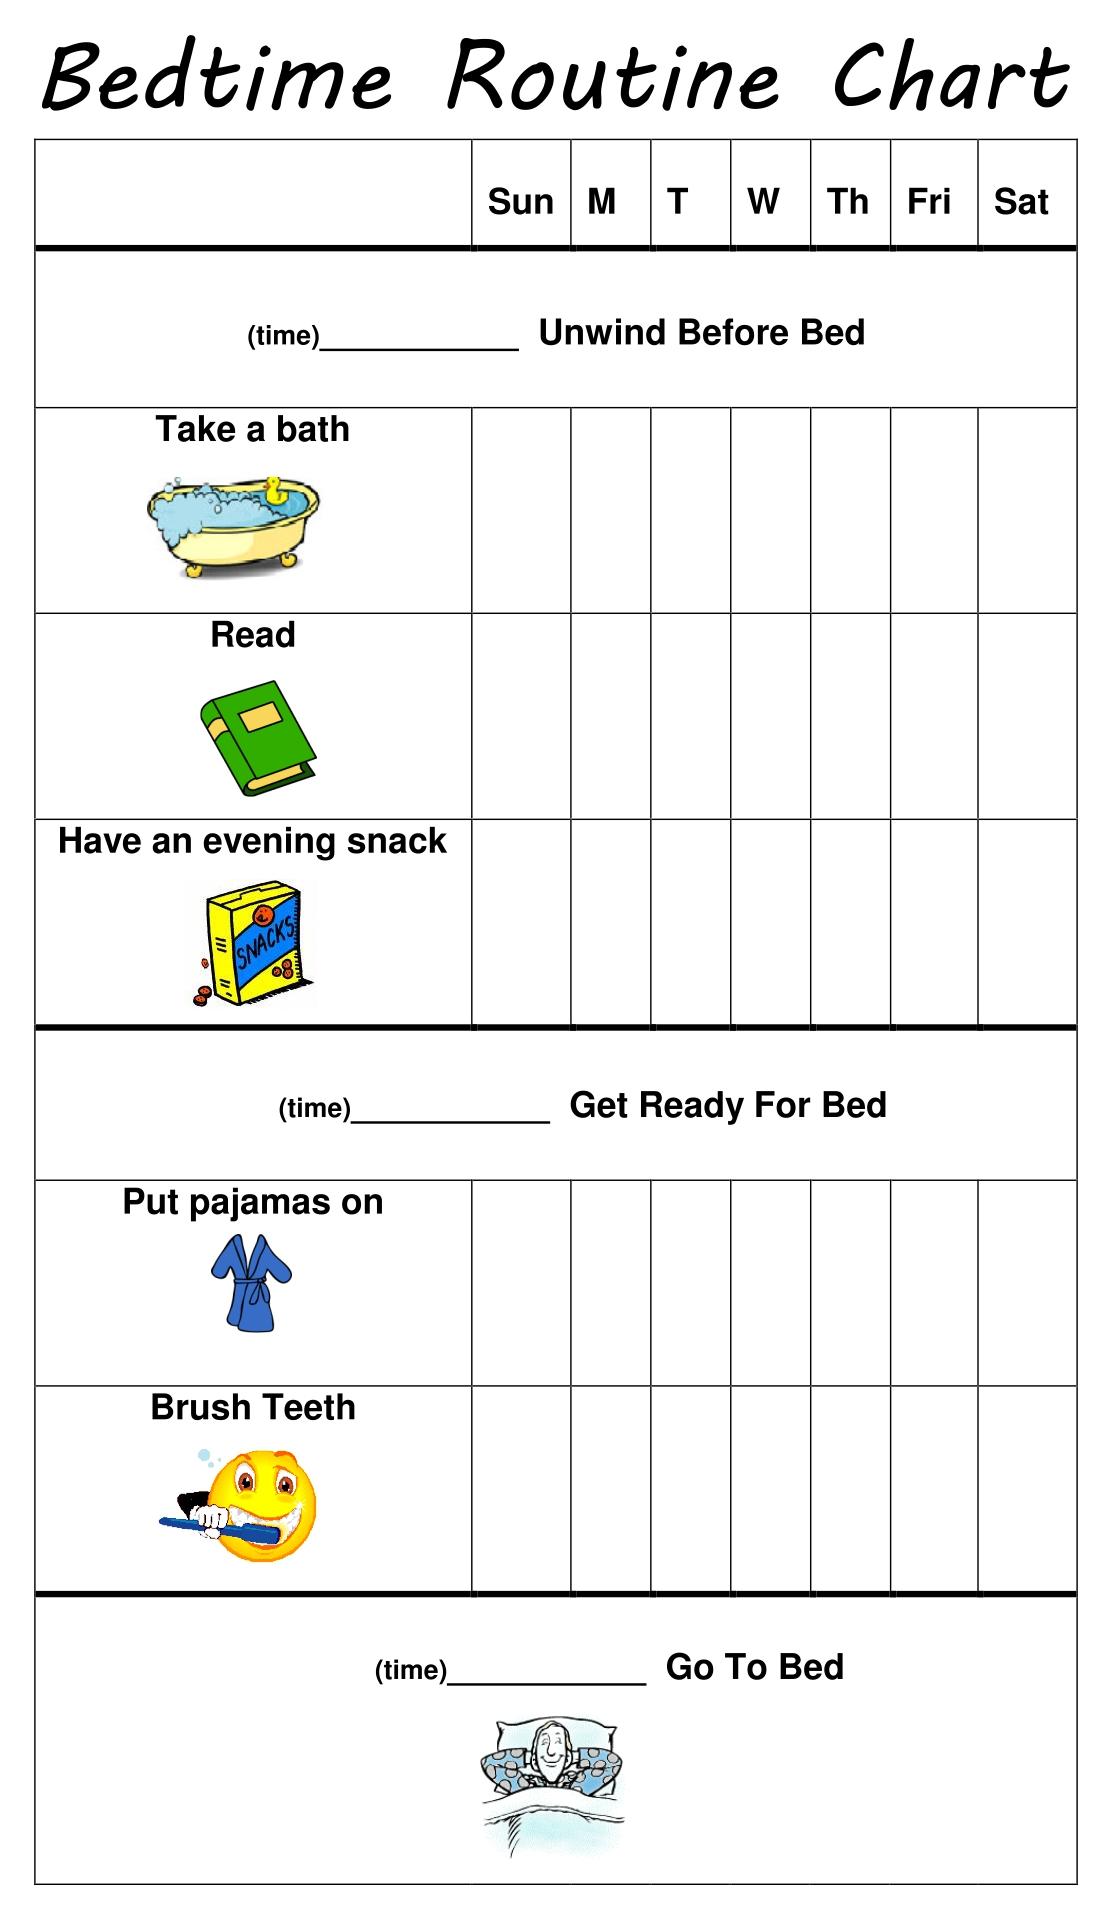 Bedtime Routine Chart Reward